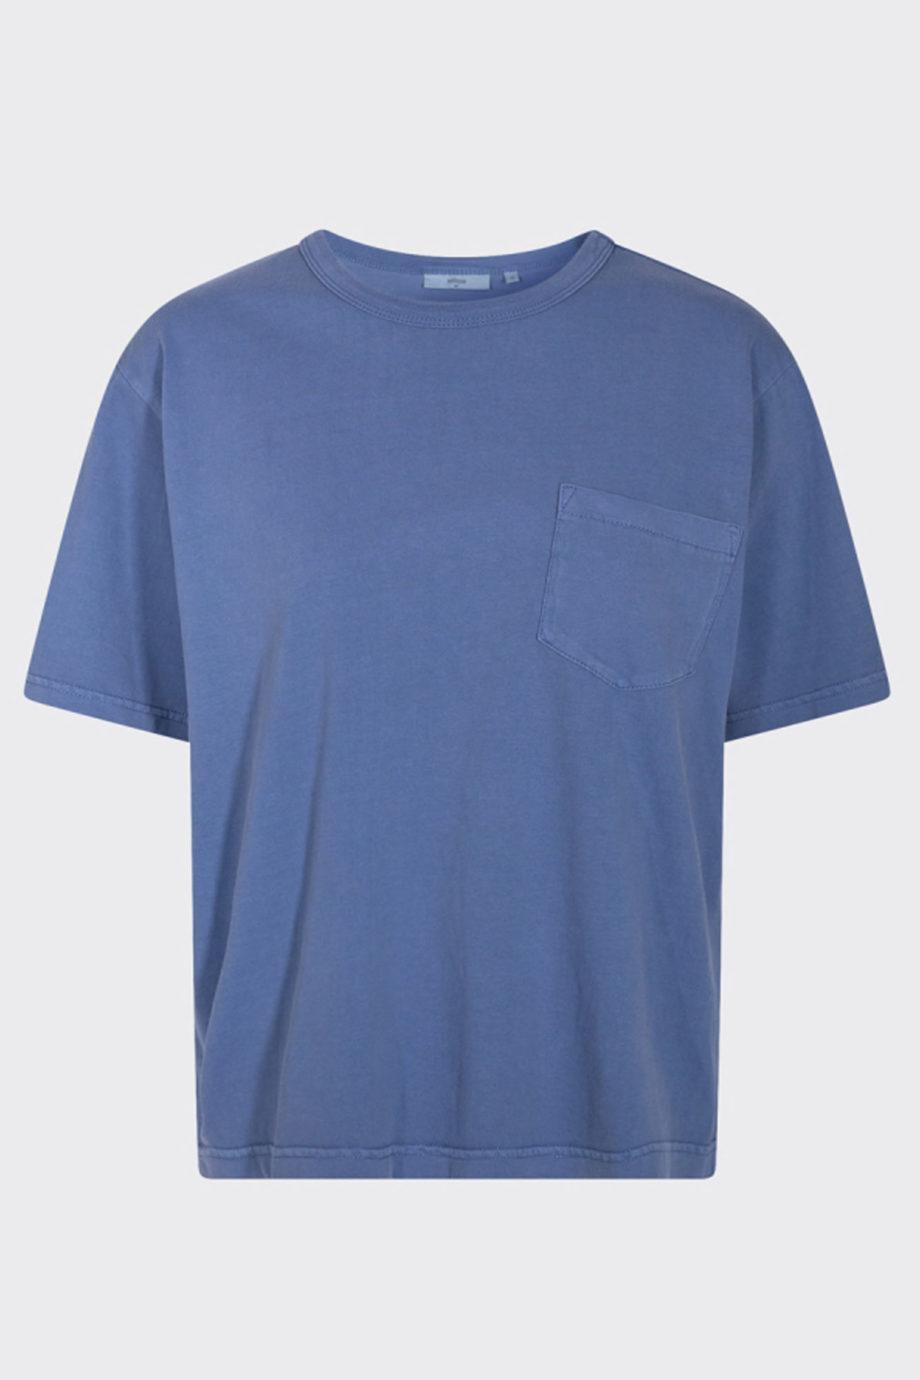 minimum-camiseta-shara-azul